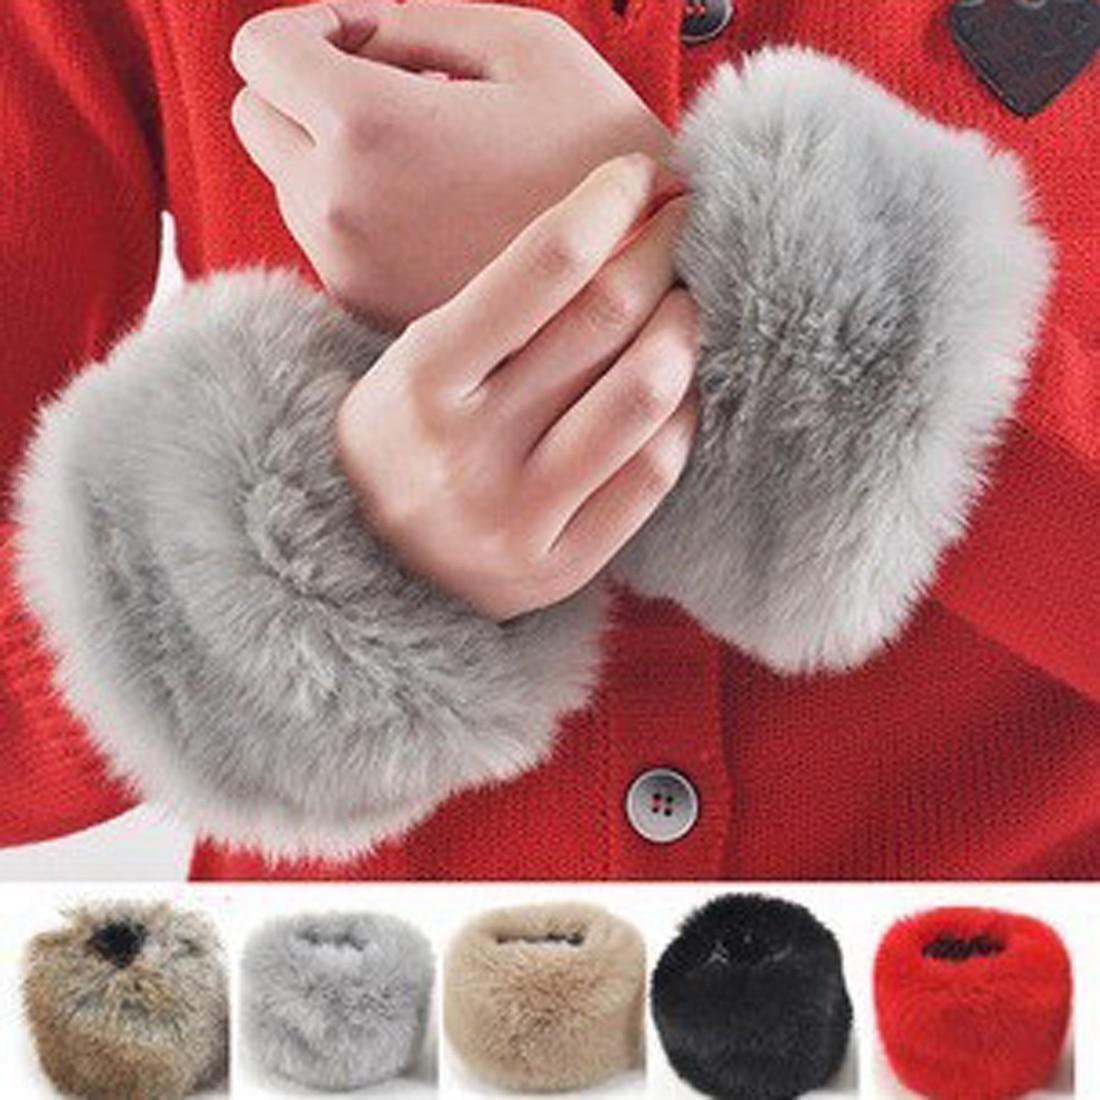 Fashion Winter Warm Faux Fur Elastic Wrist Slap On Cuffs For Women Ladies 1 Pair Solid Color Arm Warmer Plush Wrist Protector